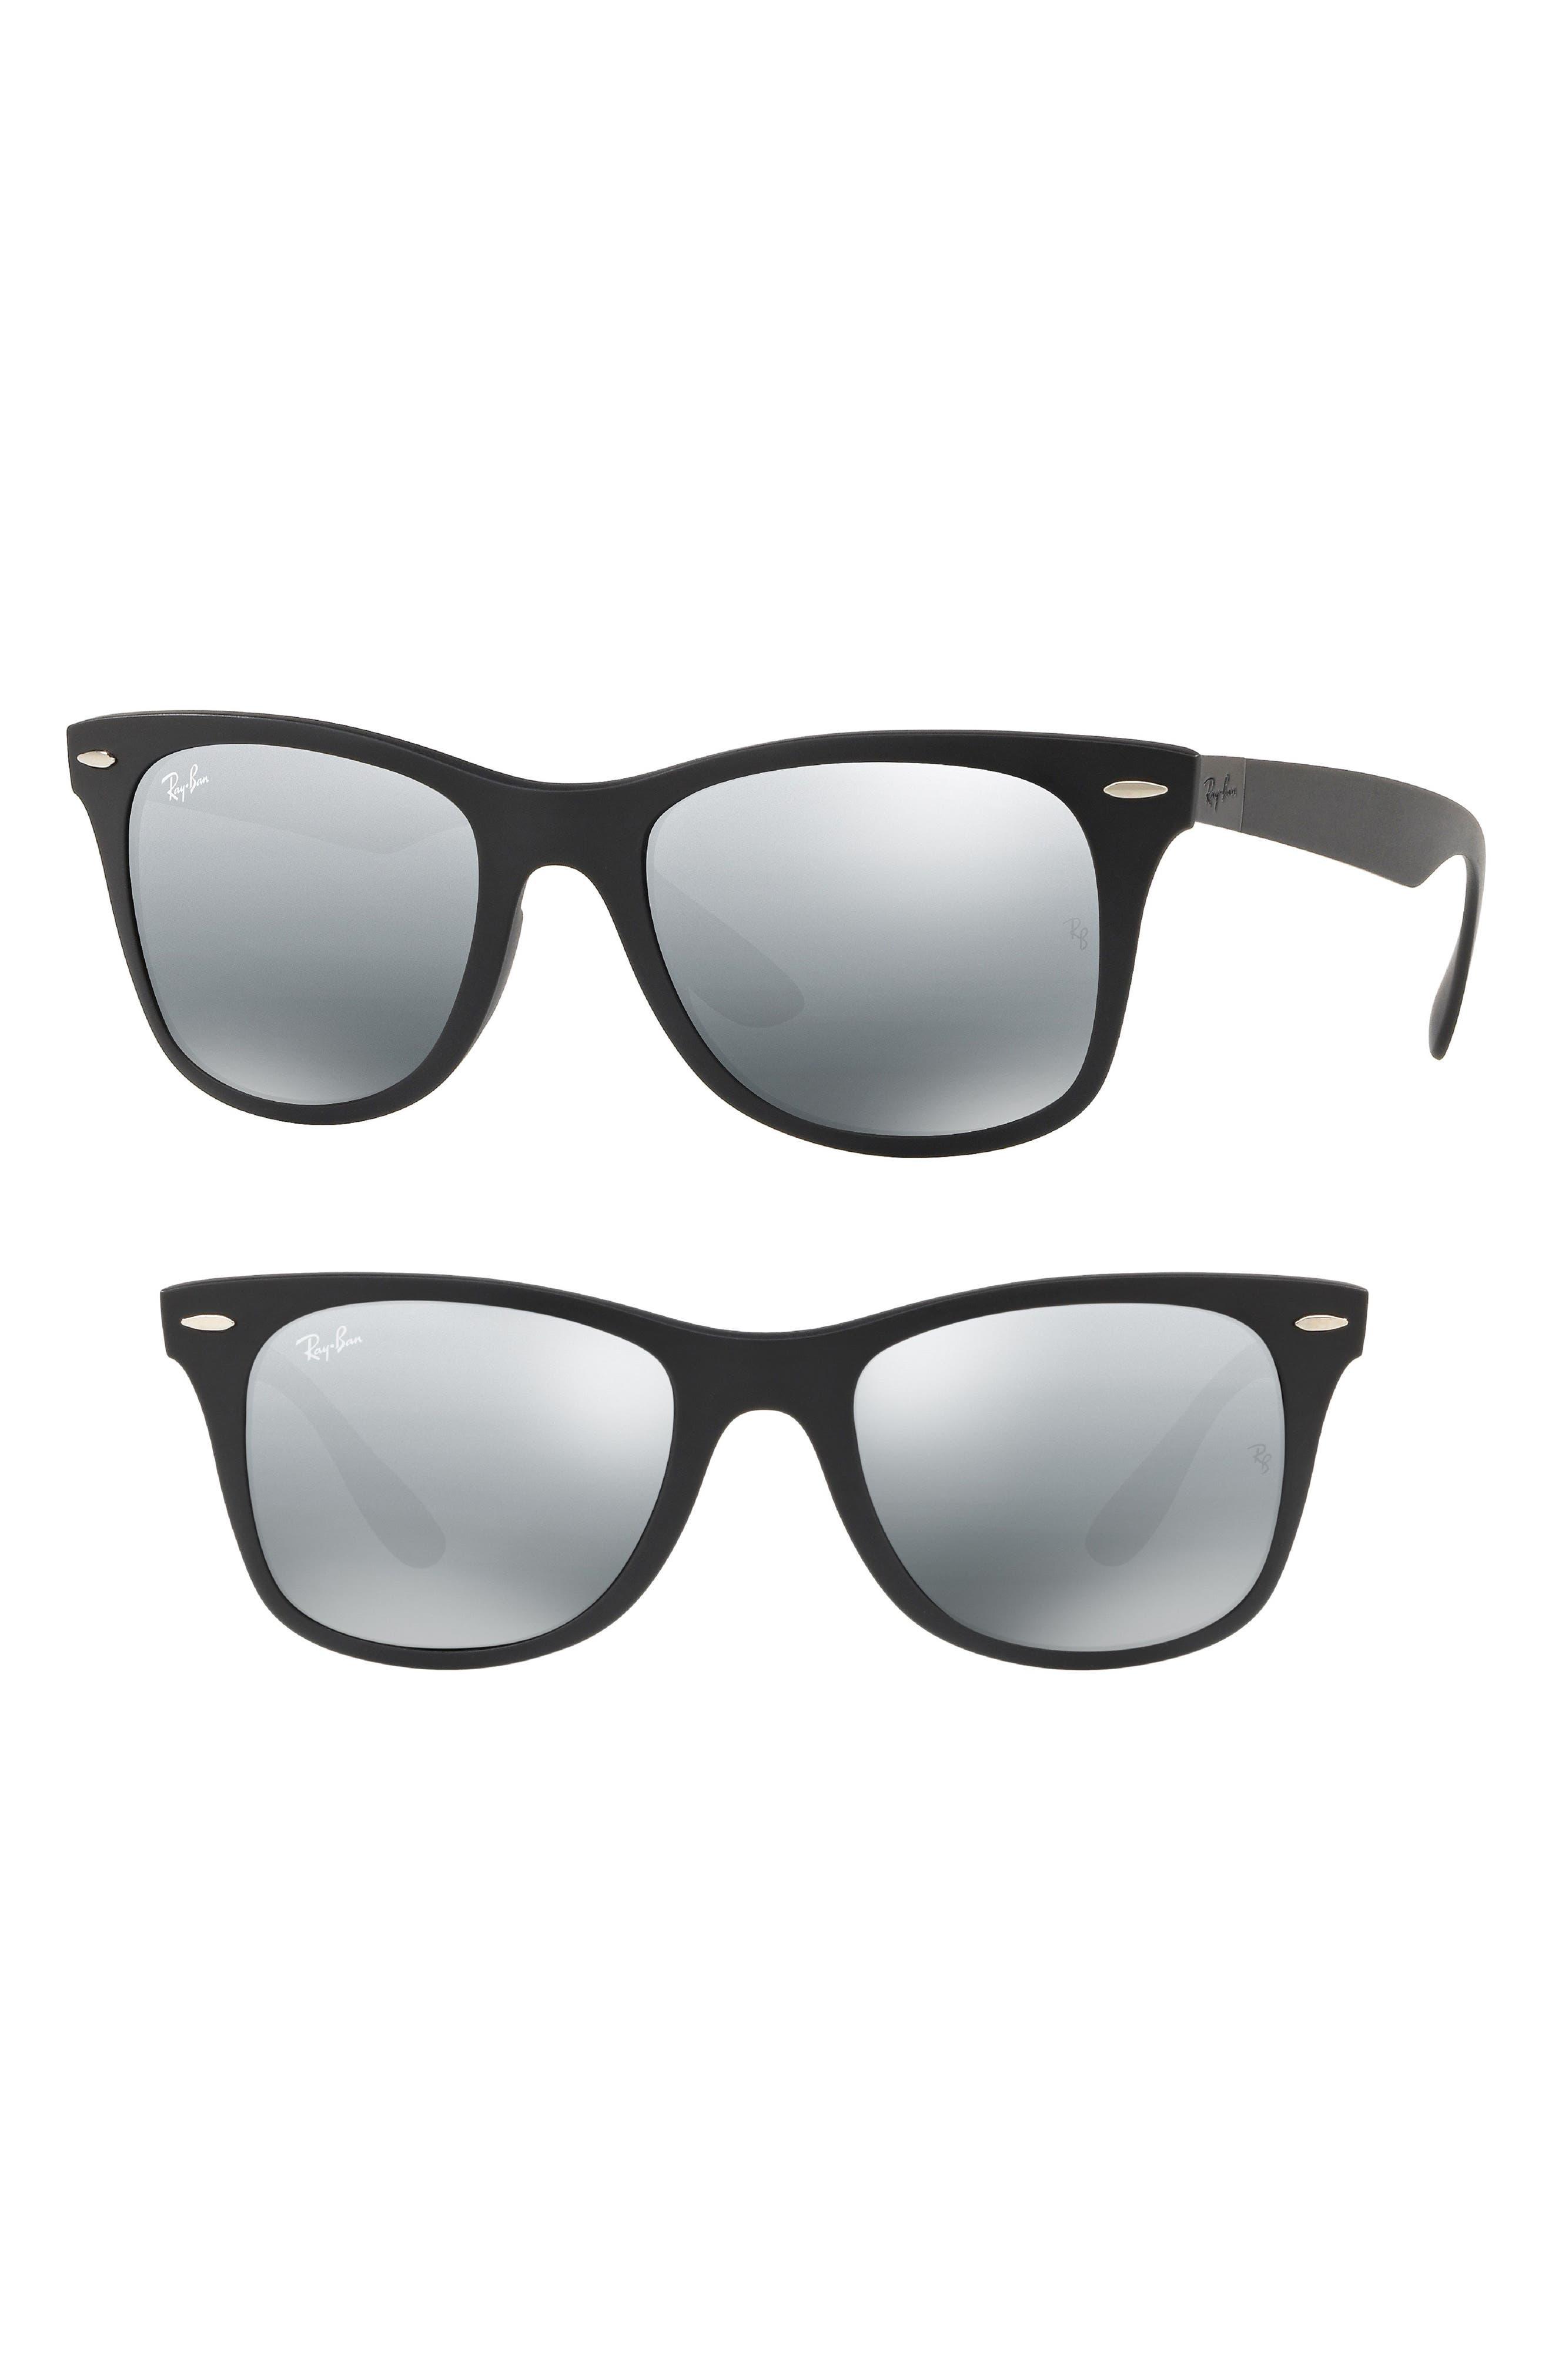 Wayfarer Liteforce 52mm Sunglasses,                             Main thumbnail 1, color,                             013